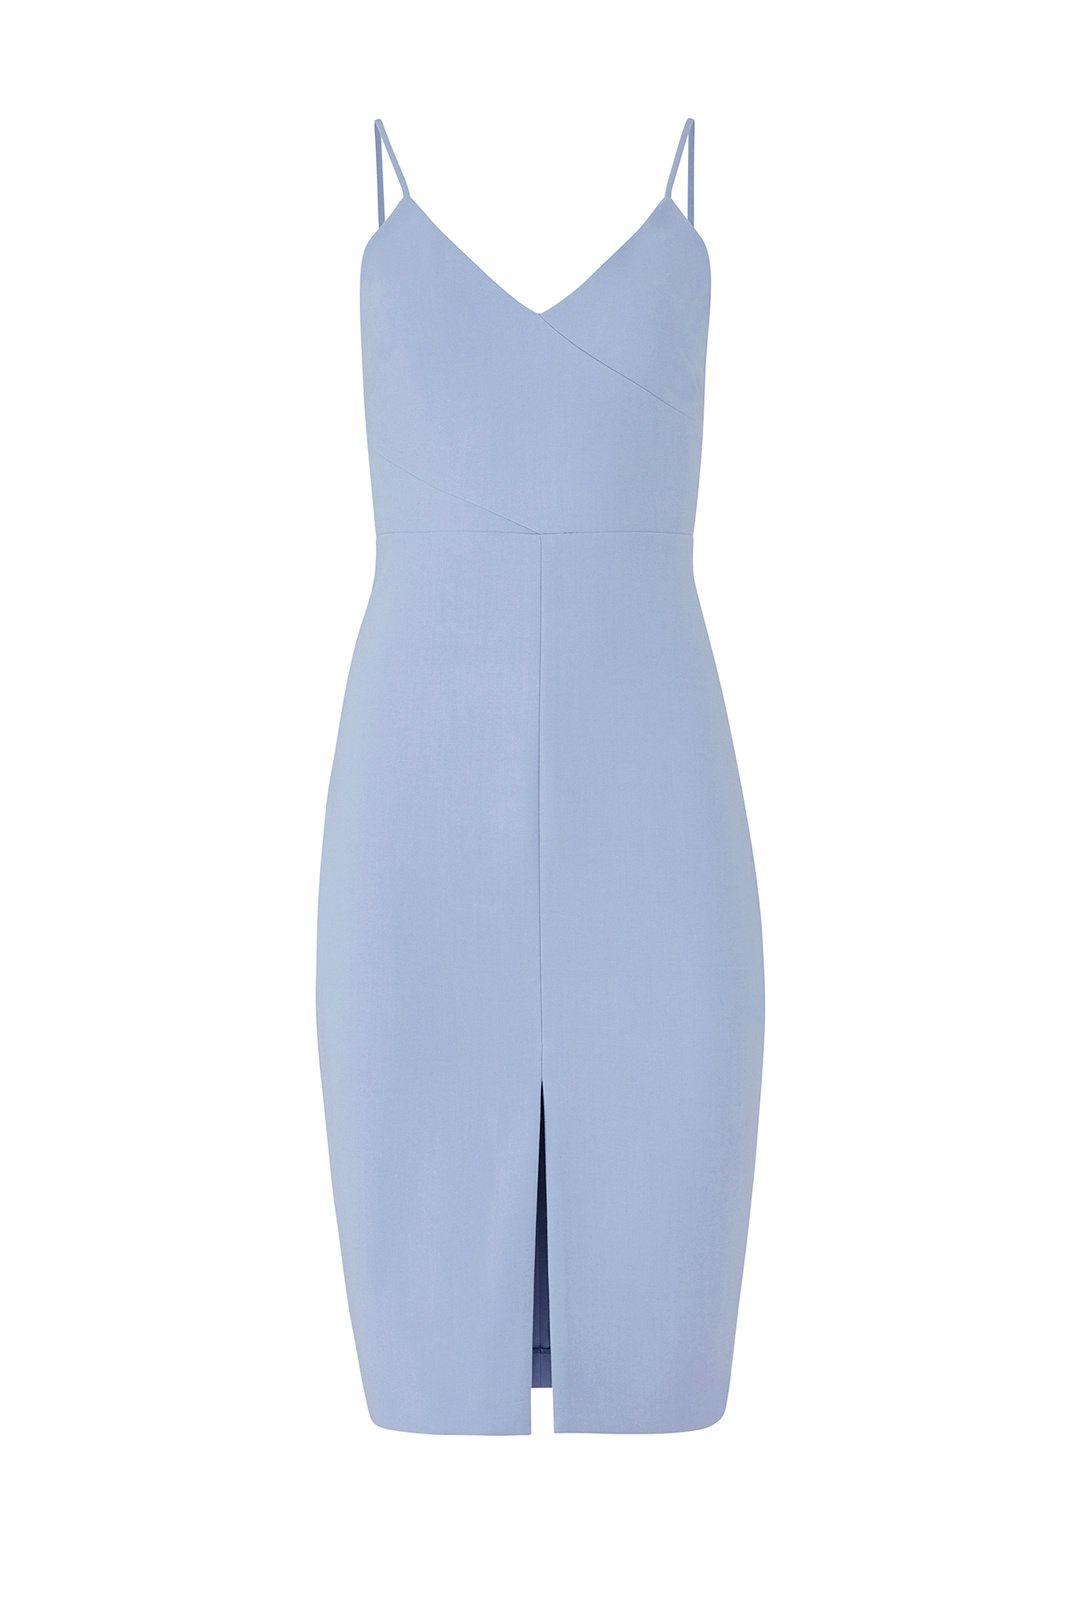 Brooklyn dress dresses part pinterest th designers and